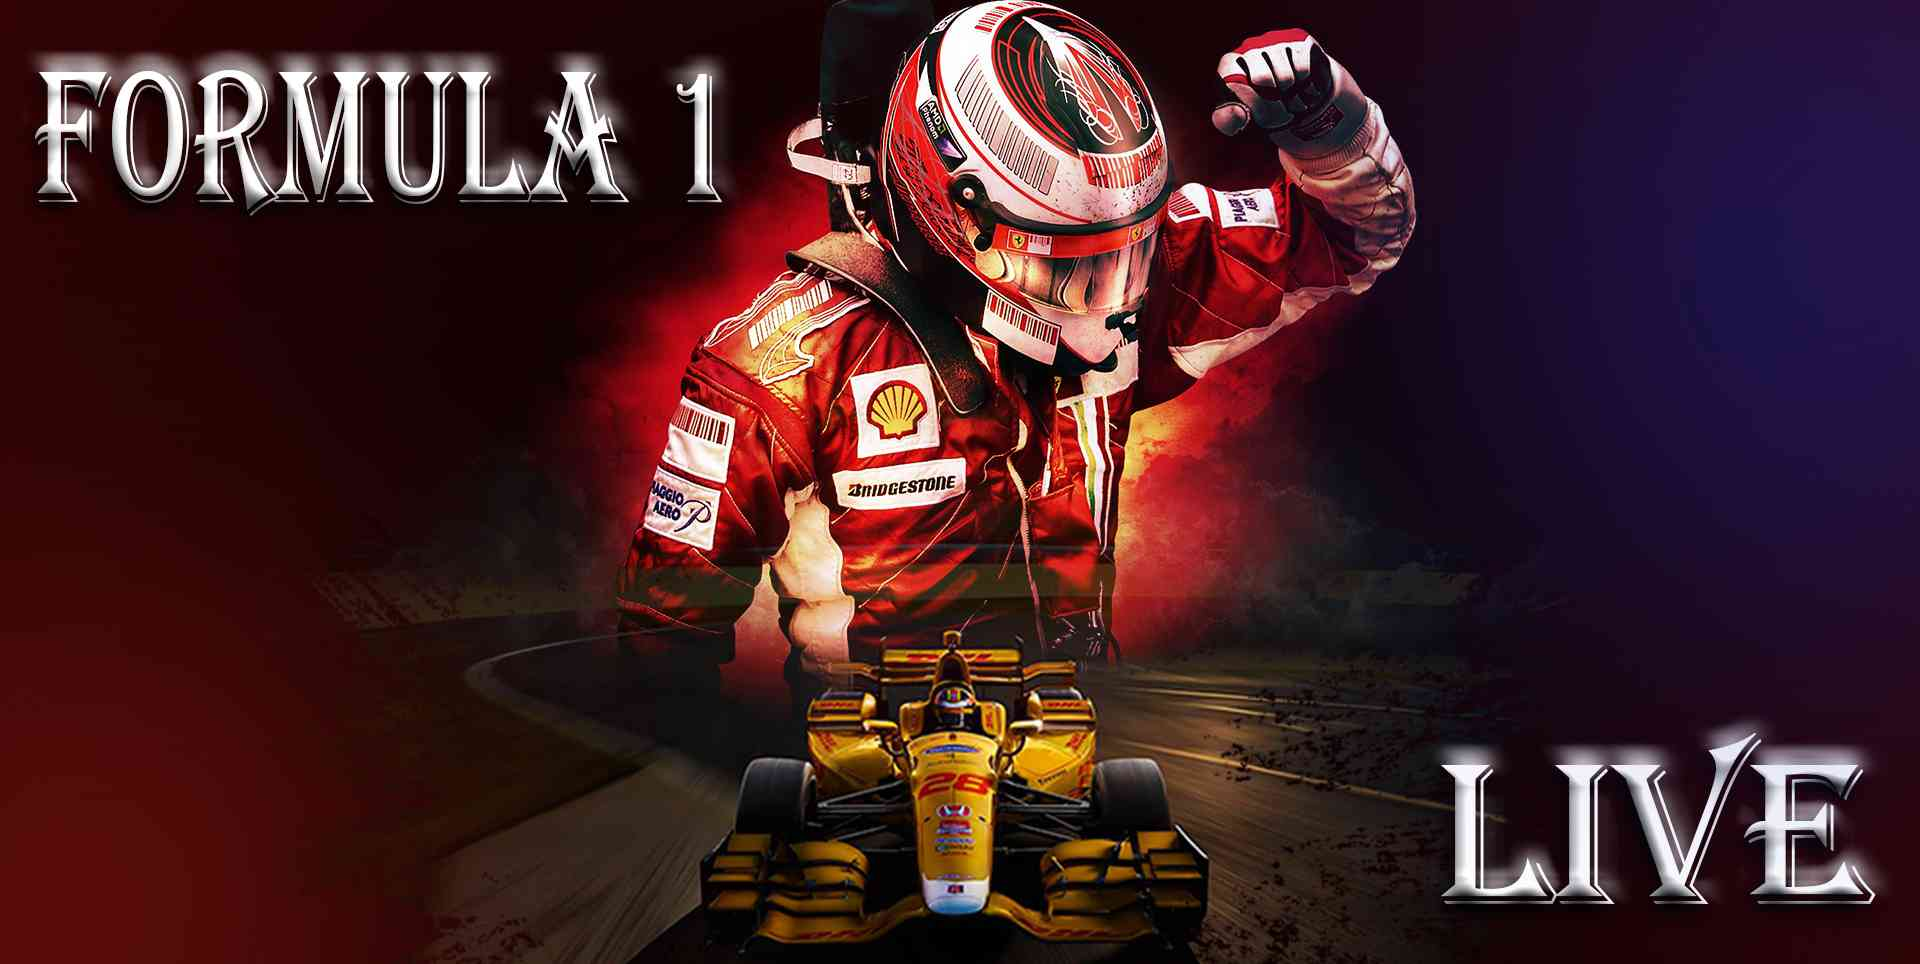 fia-formula-e-championship-2016-live-streaming